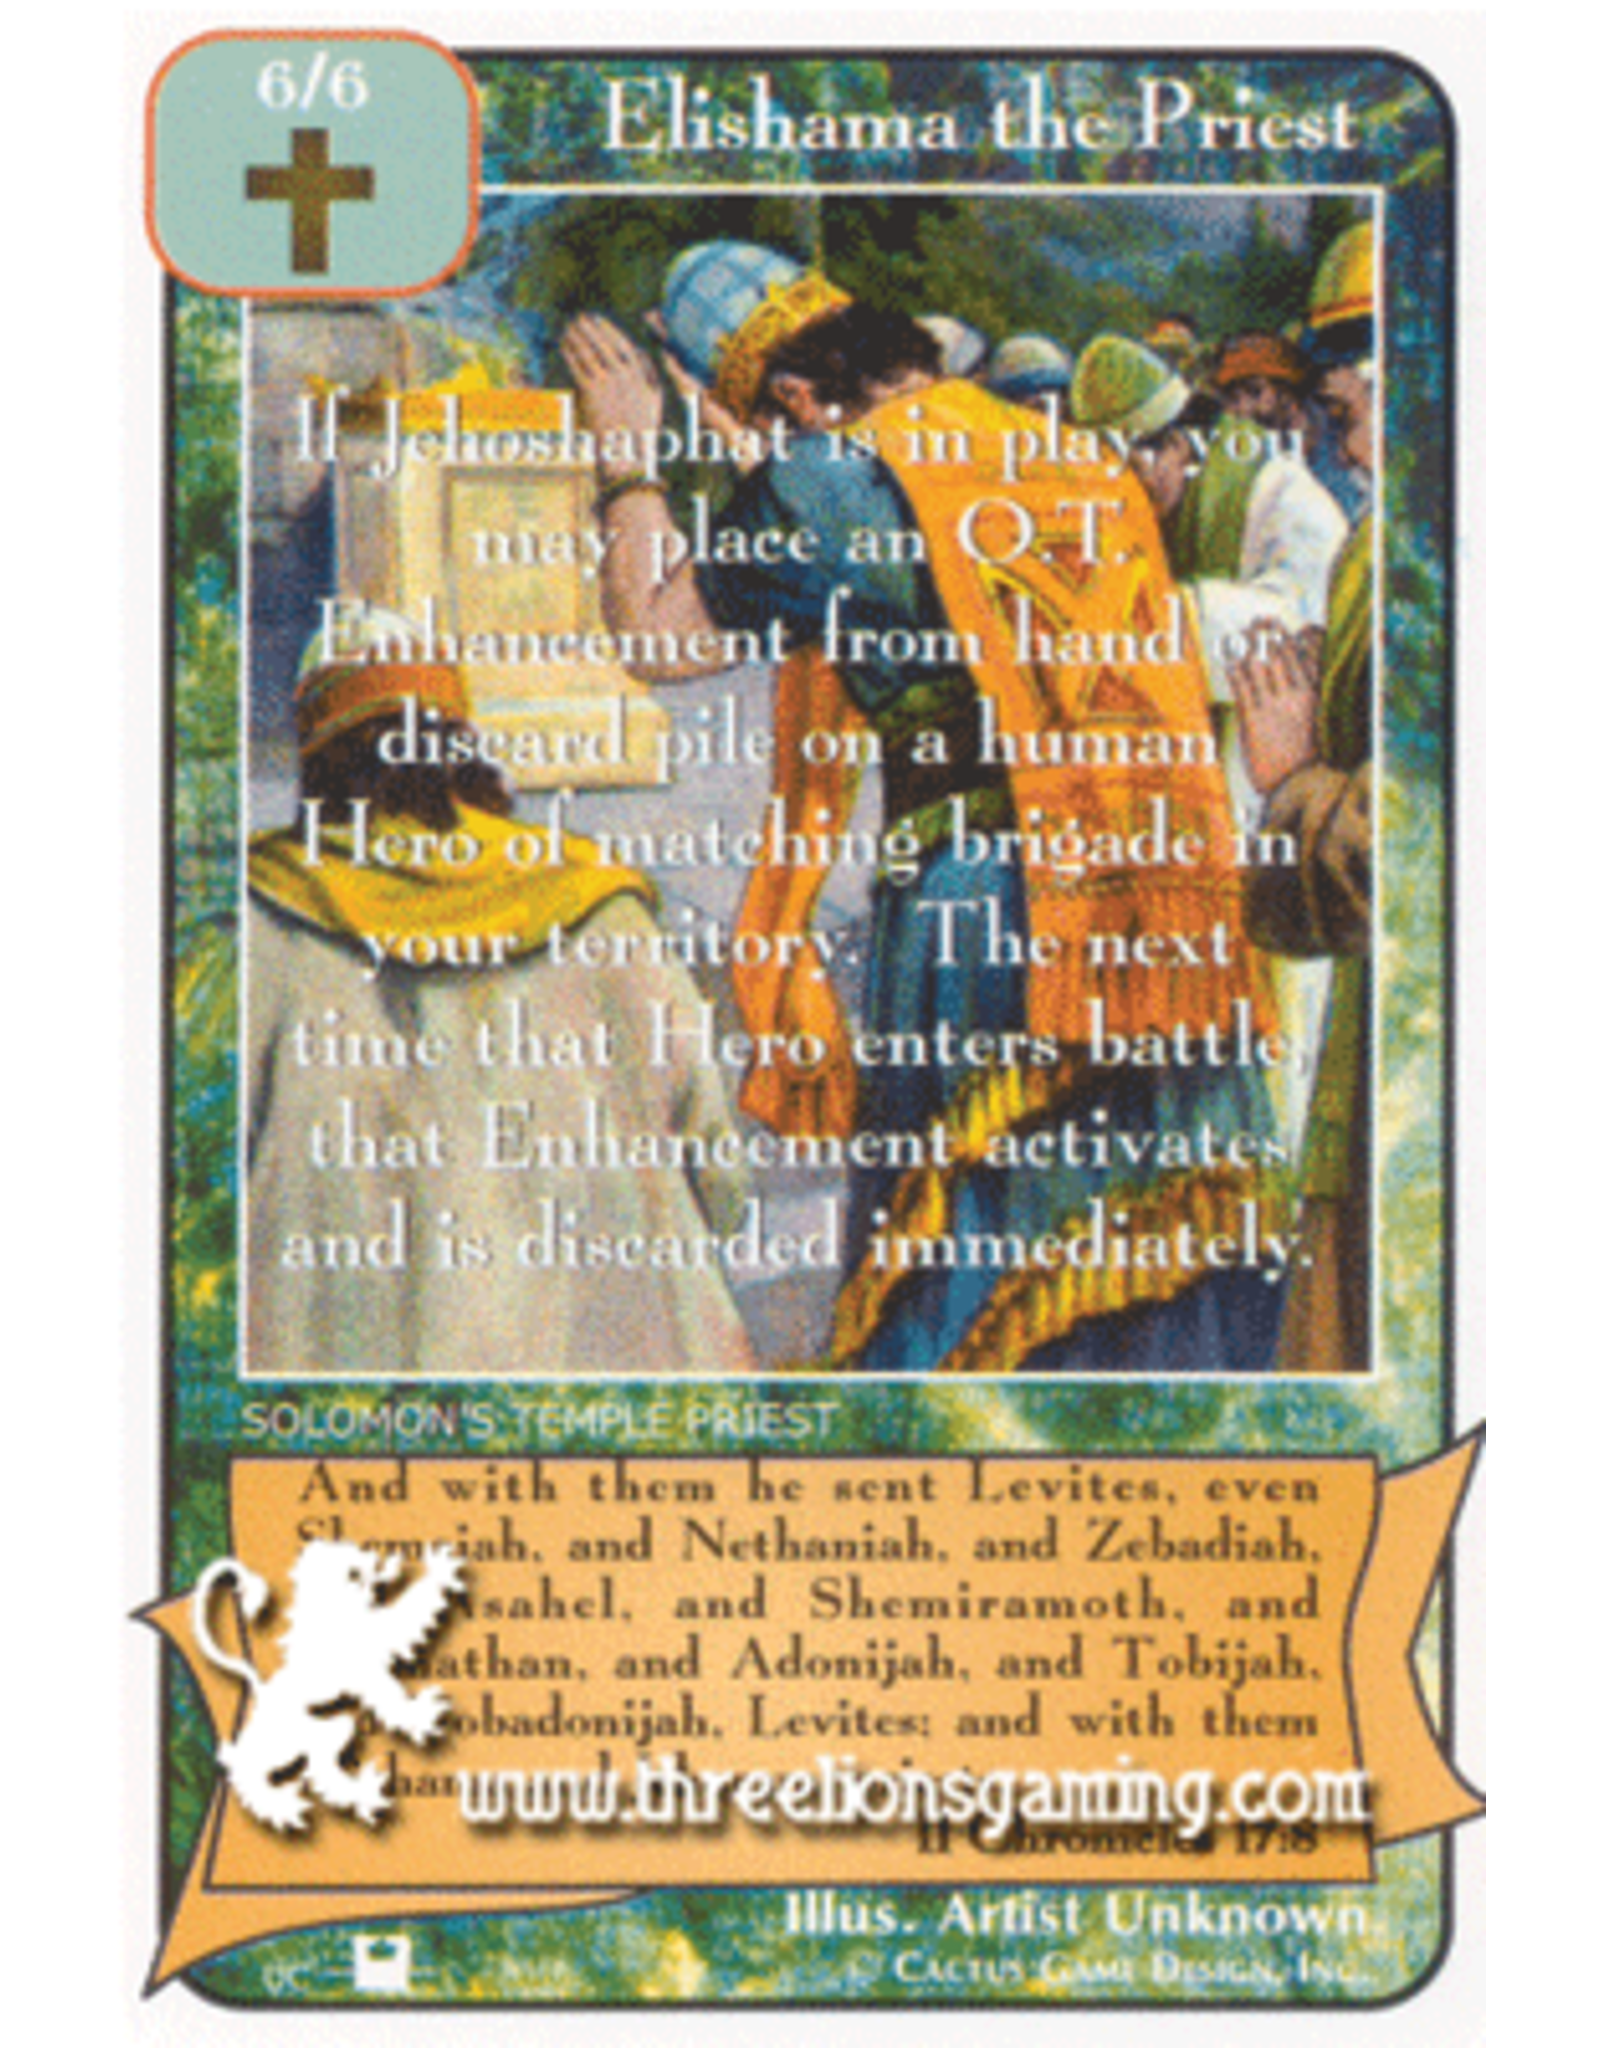 Priests: Elishama the Priest